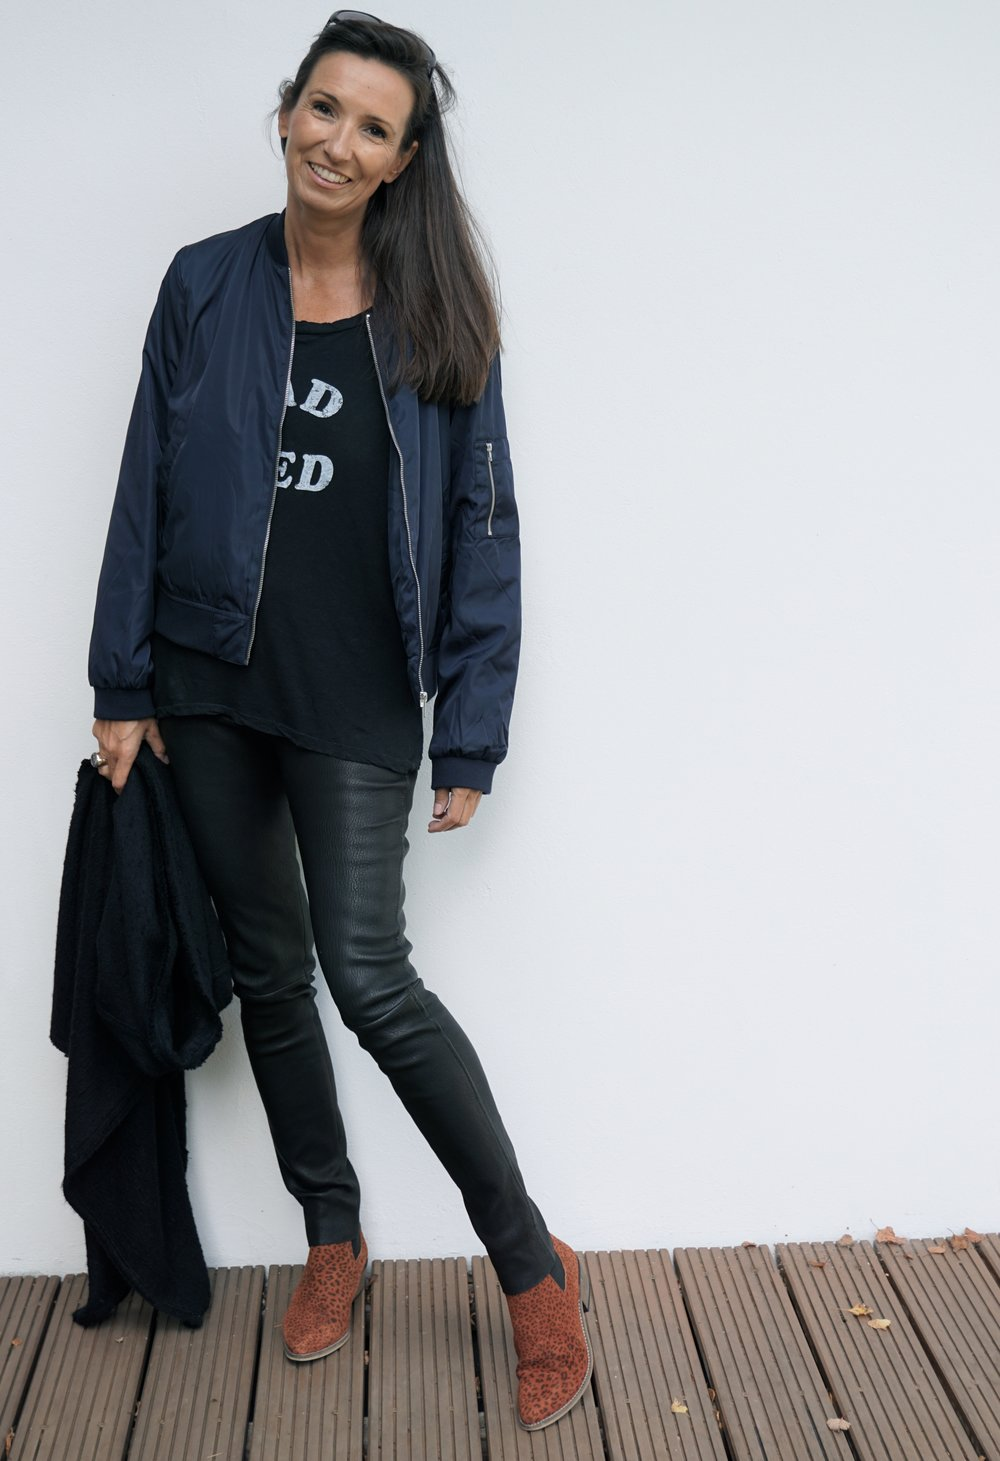 Schuhe: Ivylee, Hose: Louis Vuitton, T-Shirt: Current/Elliot, lange Weste: Isabel Marant, Bomberjacke: MOSS COPENHAGEN